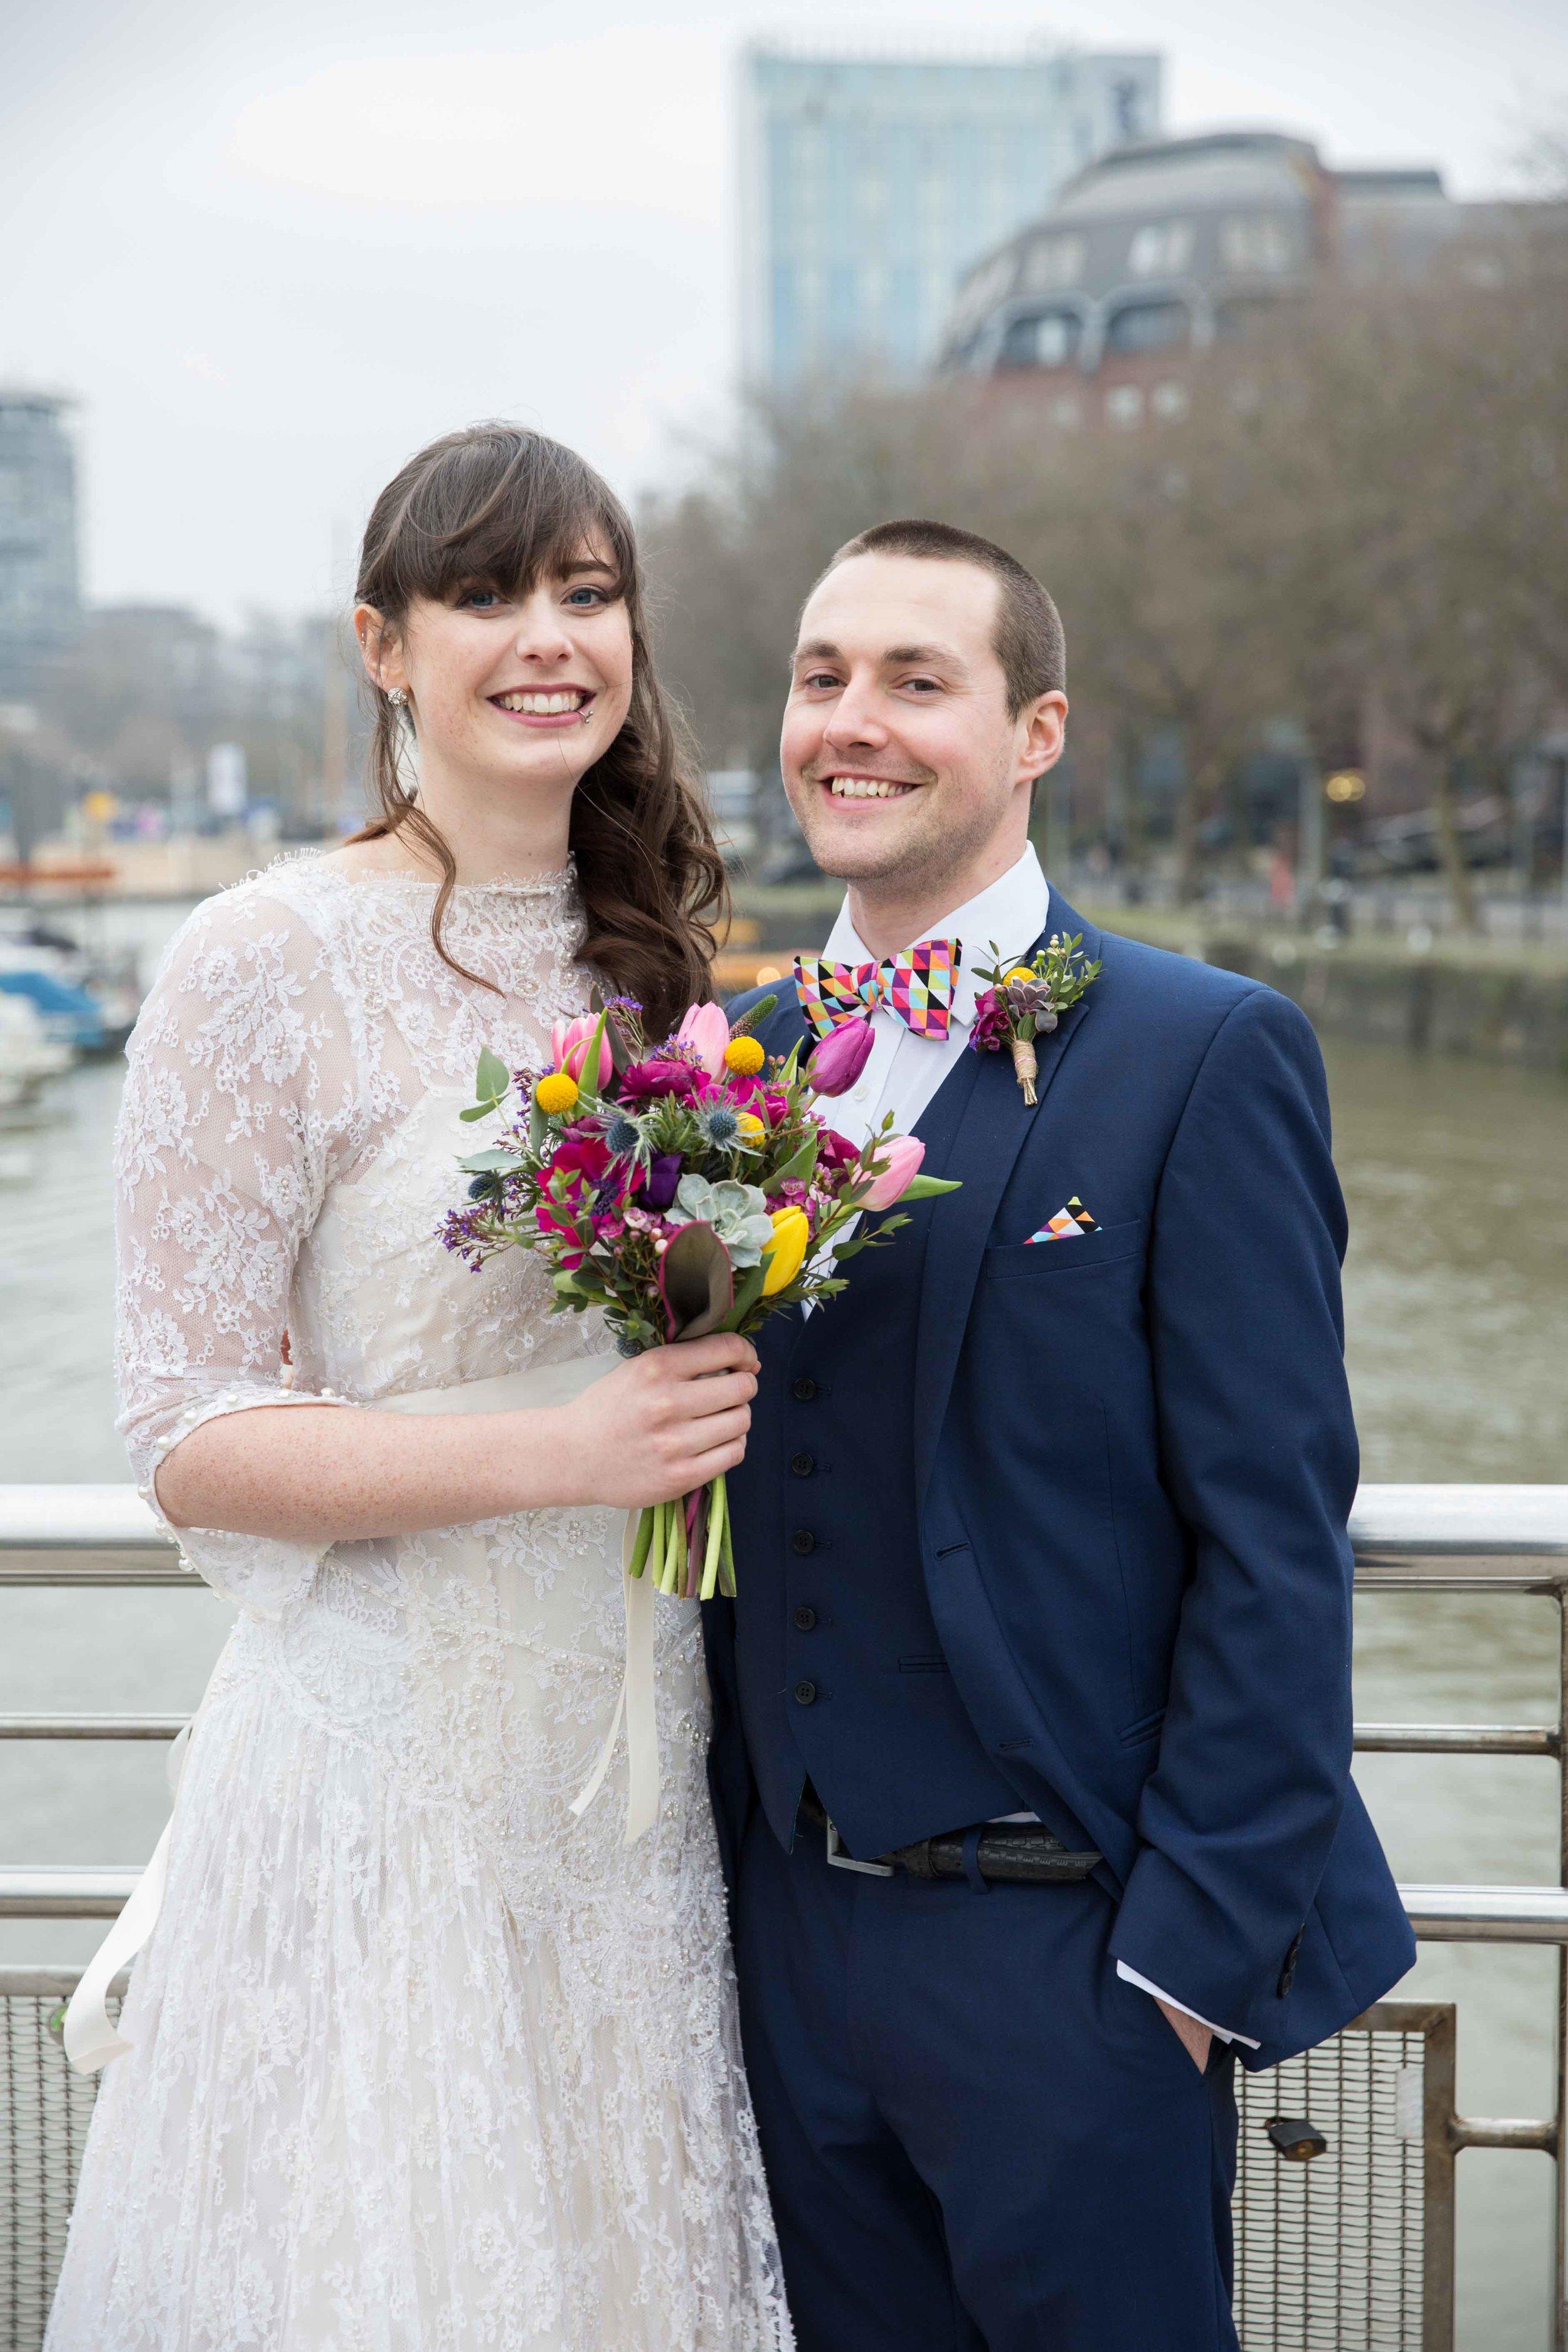 Adam & Faye - Wright Wedding Photography - Bristol Wedding Photographer -247.jpg